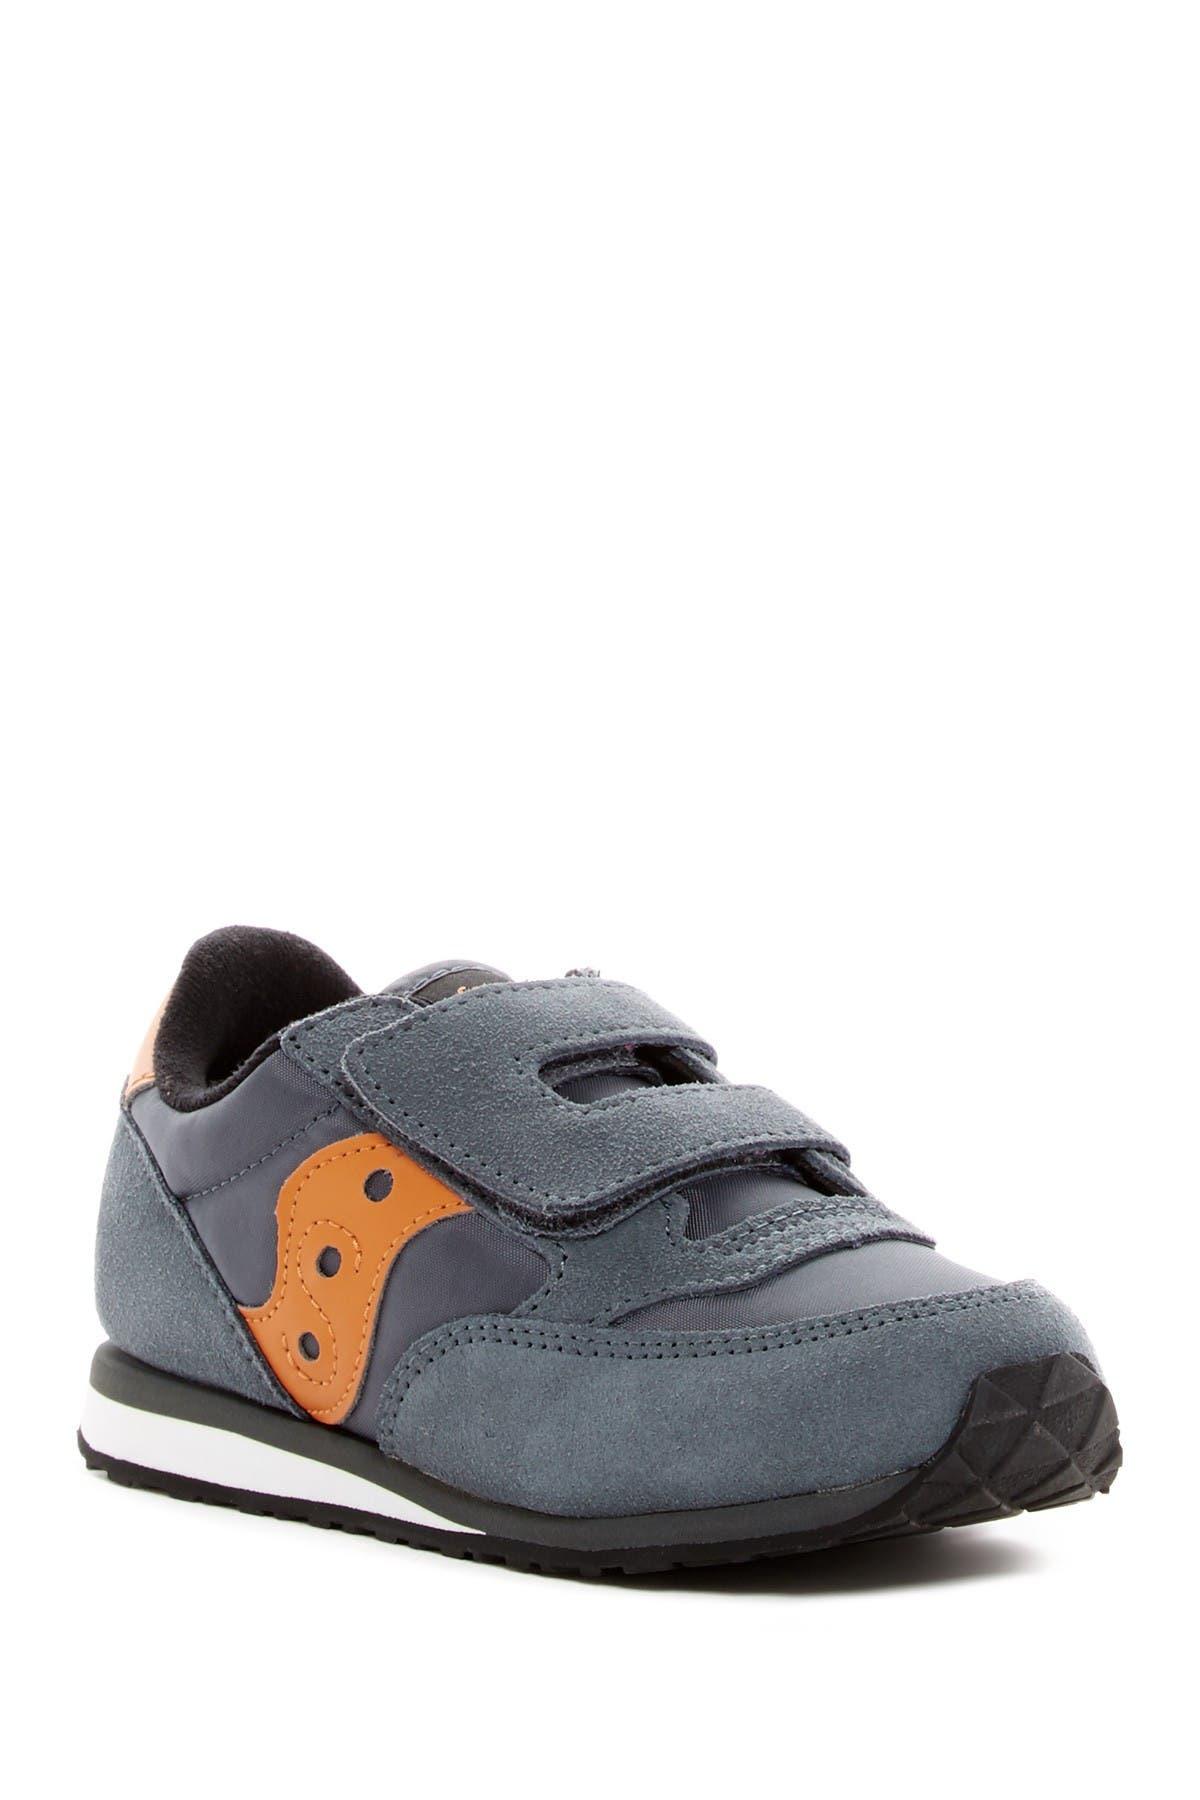 Saucony   Jazz Hook \u0026 Loop Sneaker